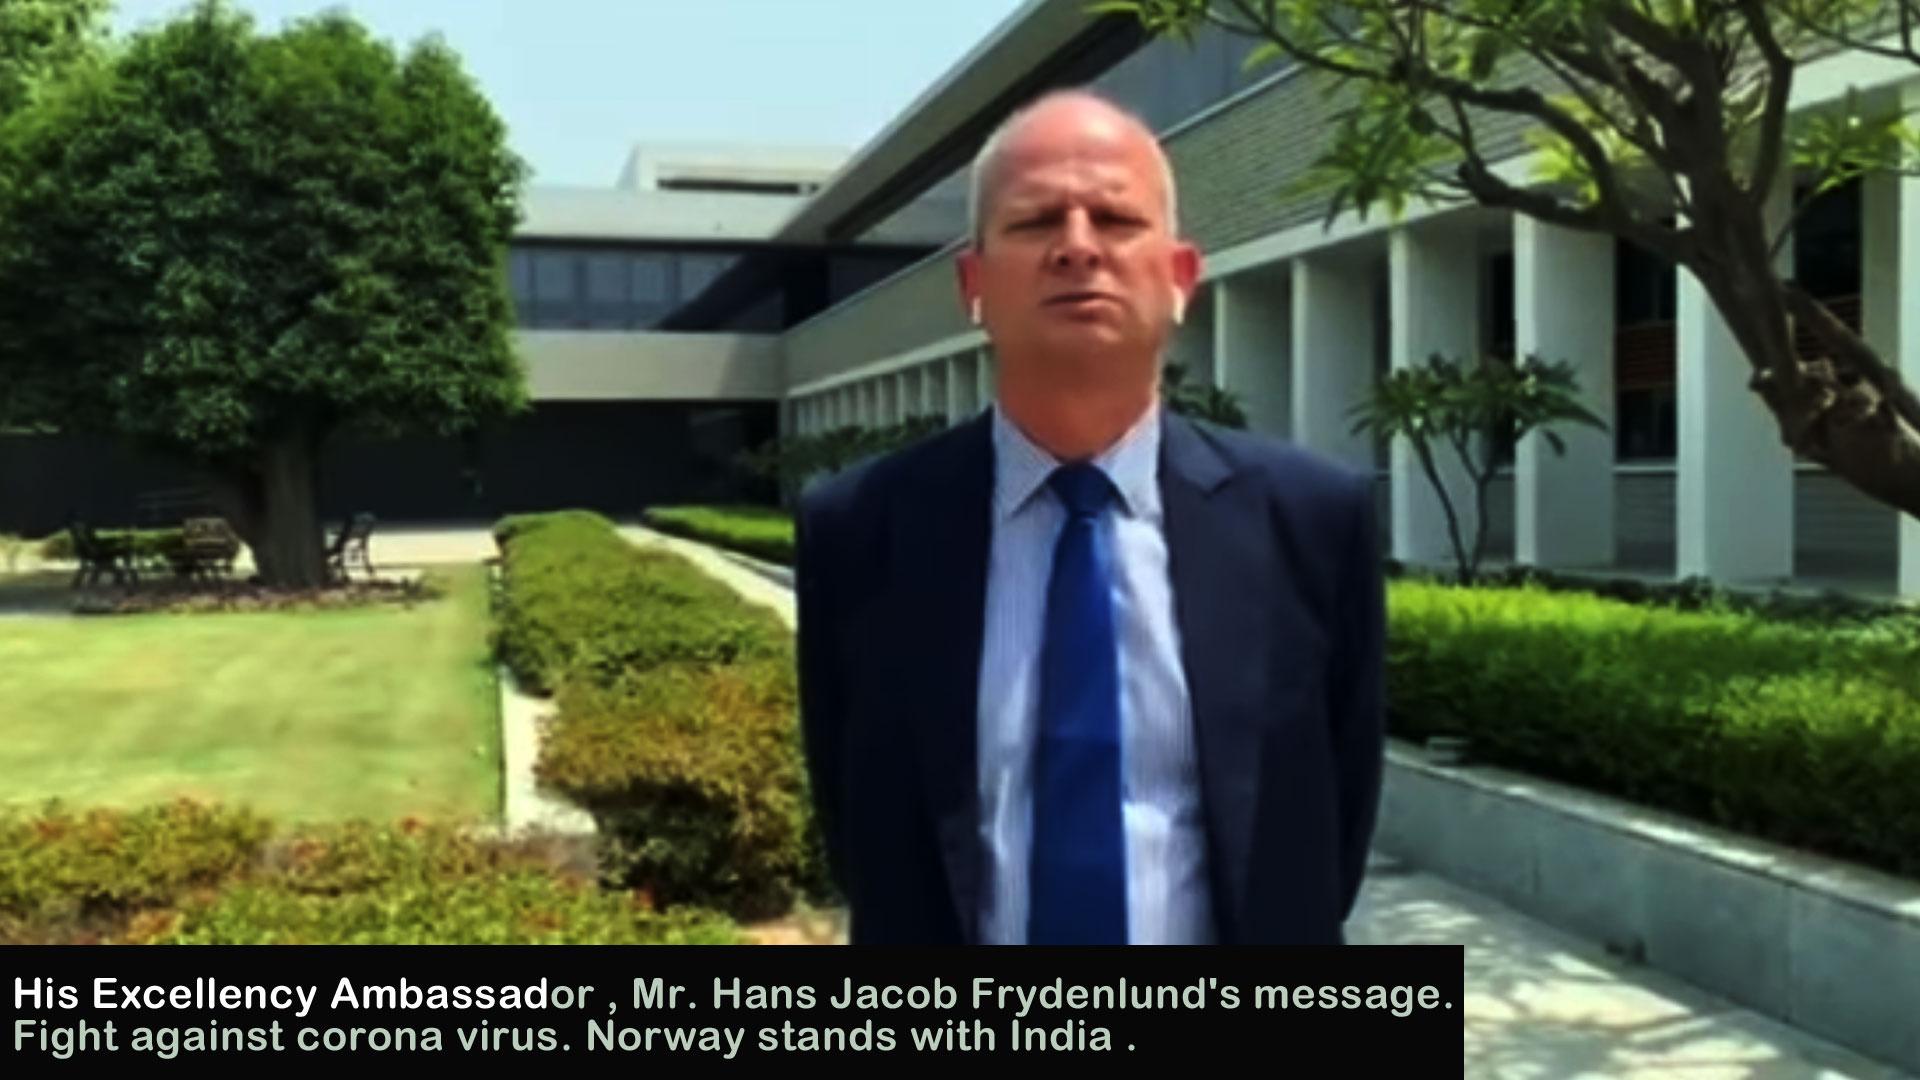 NORWAY SUPPORTS INDIA, H.E. AMBASSADOR, HANS JACOB FRYDENLUND's MESSAGE ON CORONA VIRUS SITUATION